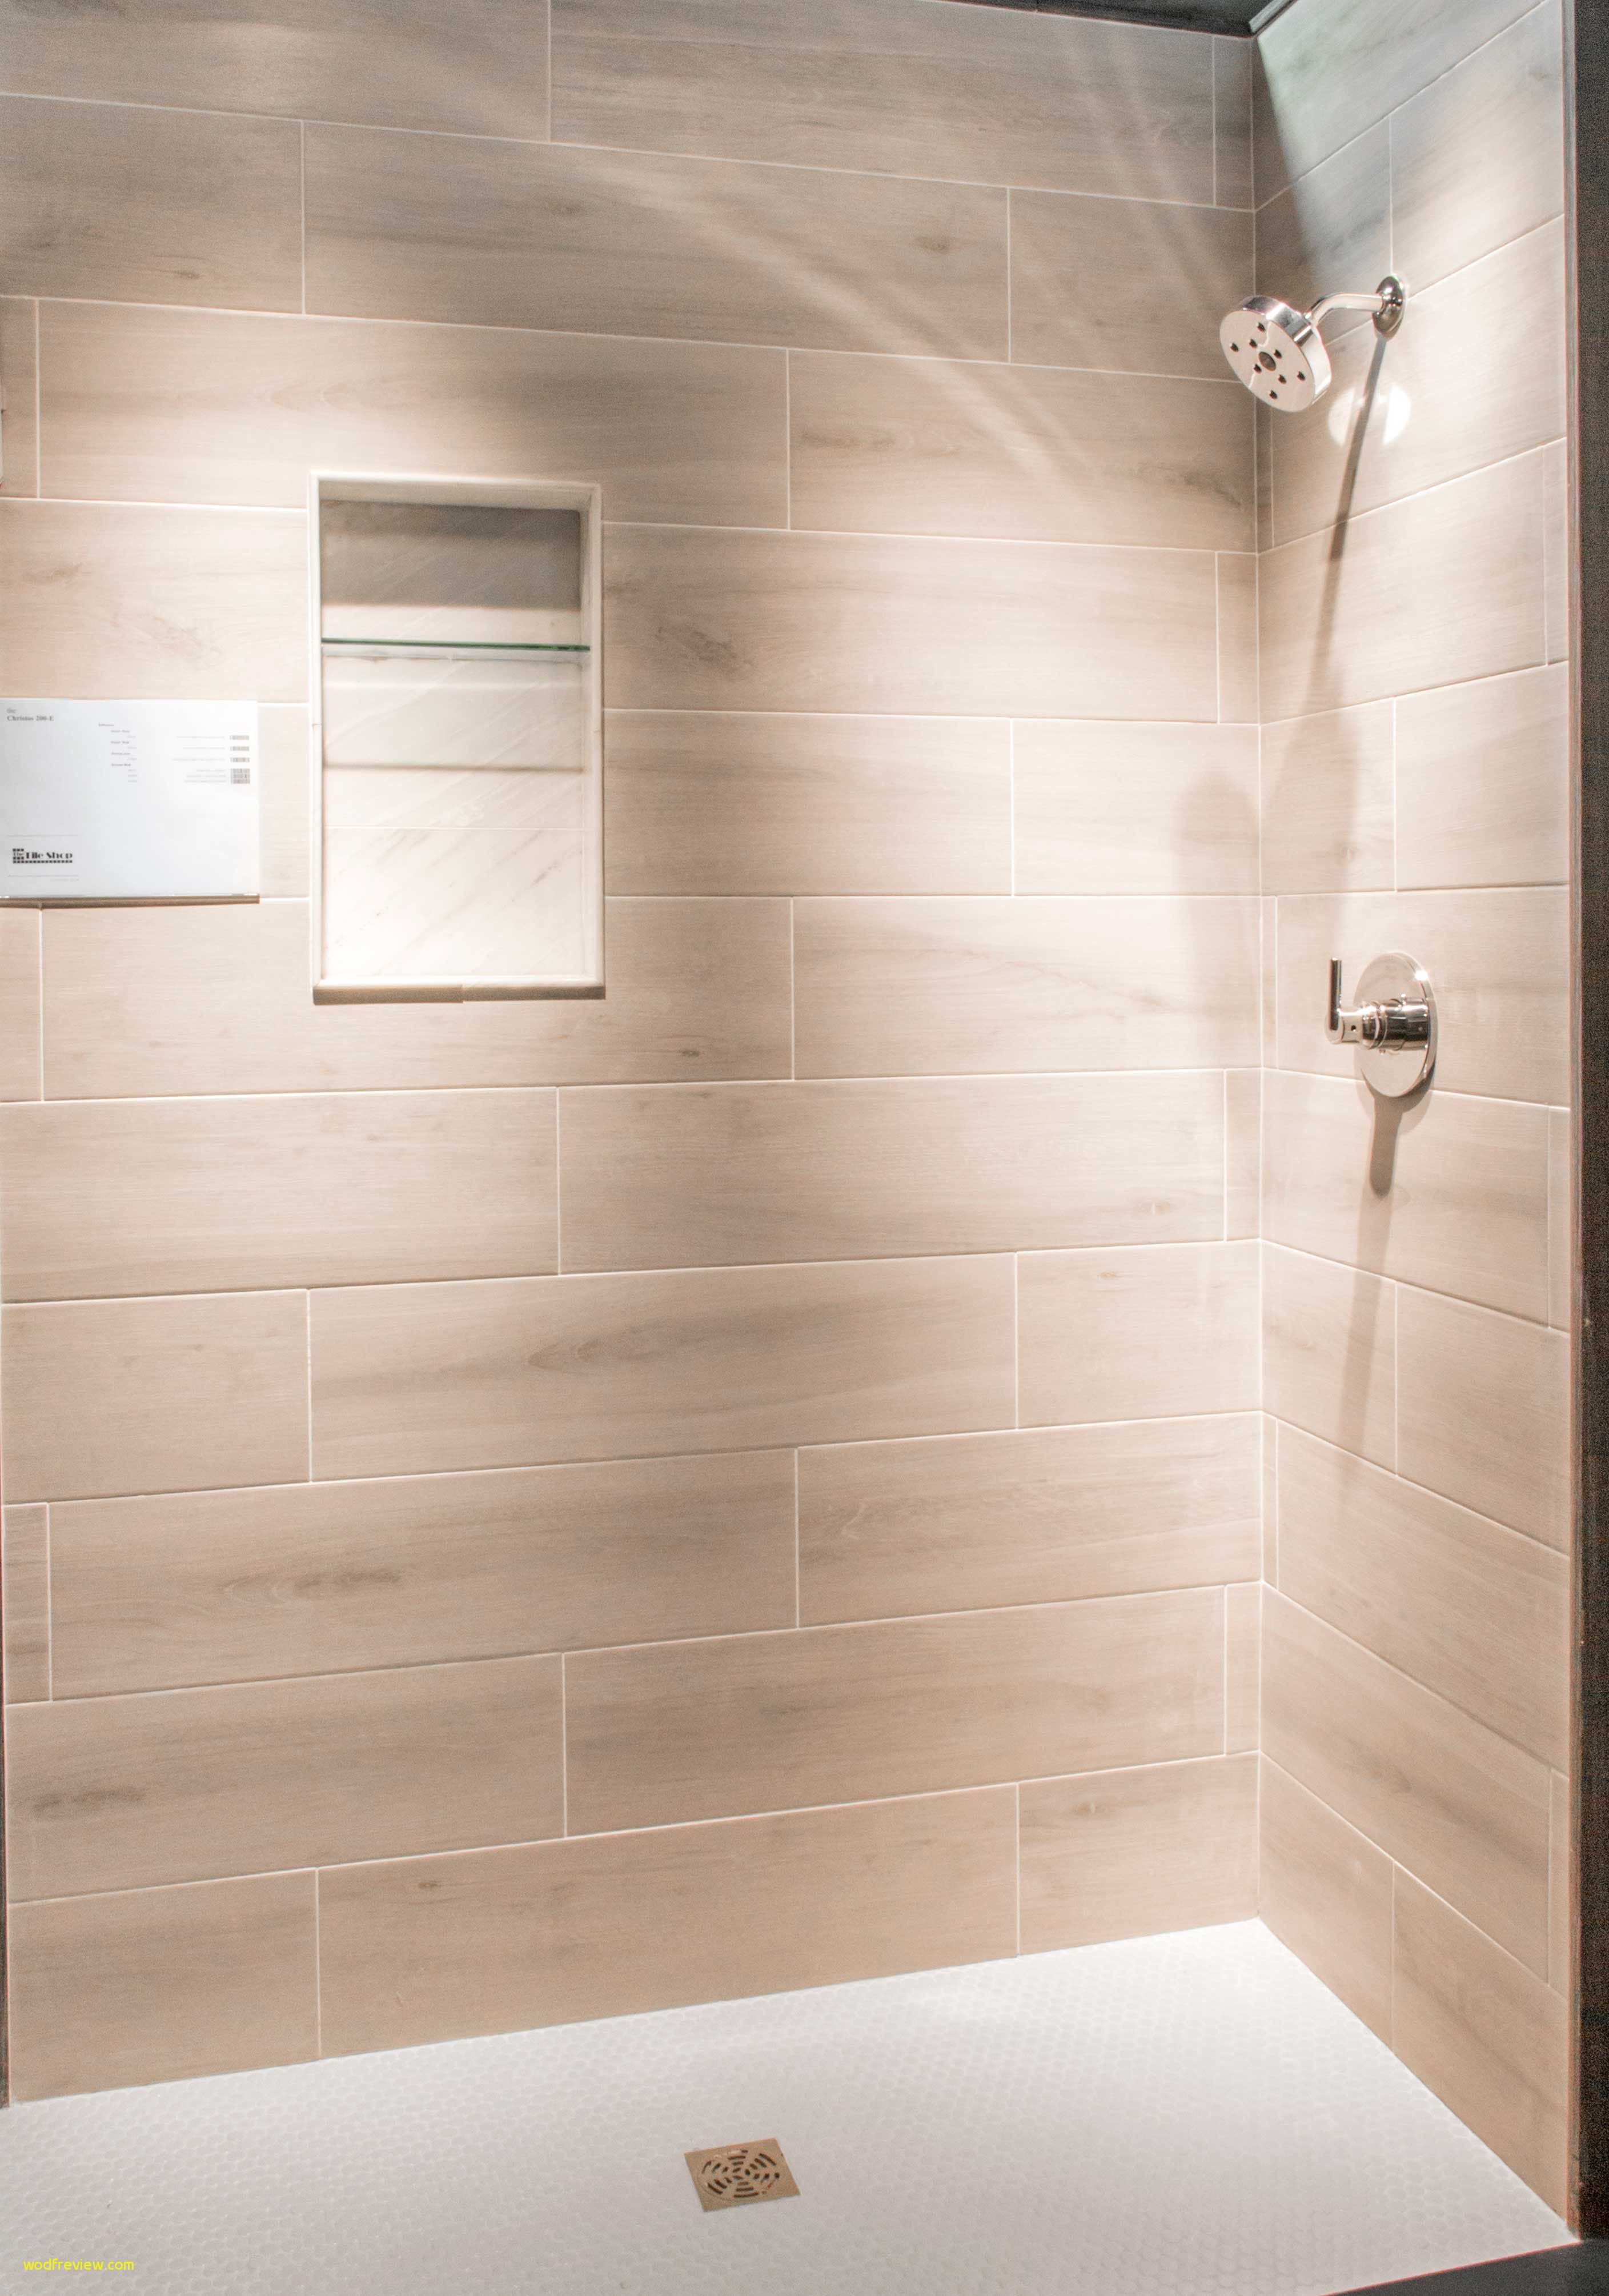 Bathroom Tile Ideas Pictures Australia Gembloongdecor Wood Tile Shower Bathroom Wall Panels Bathroom Shower Walls